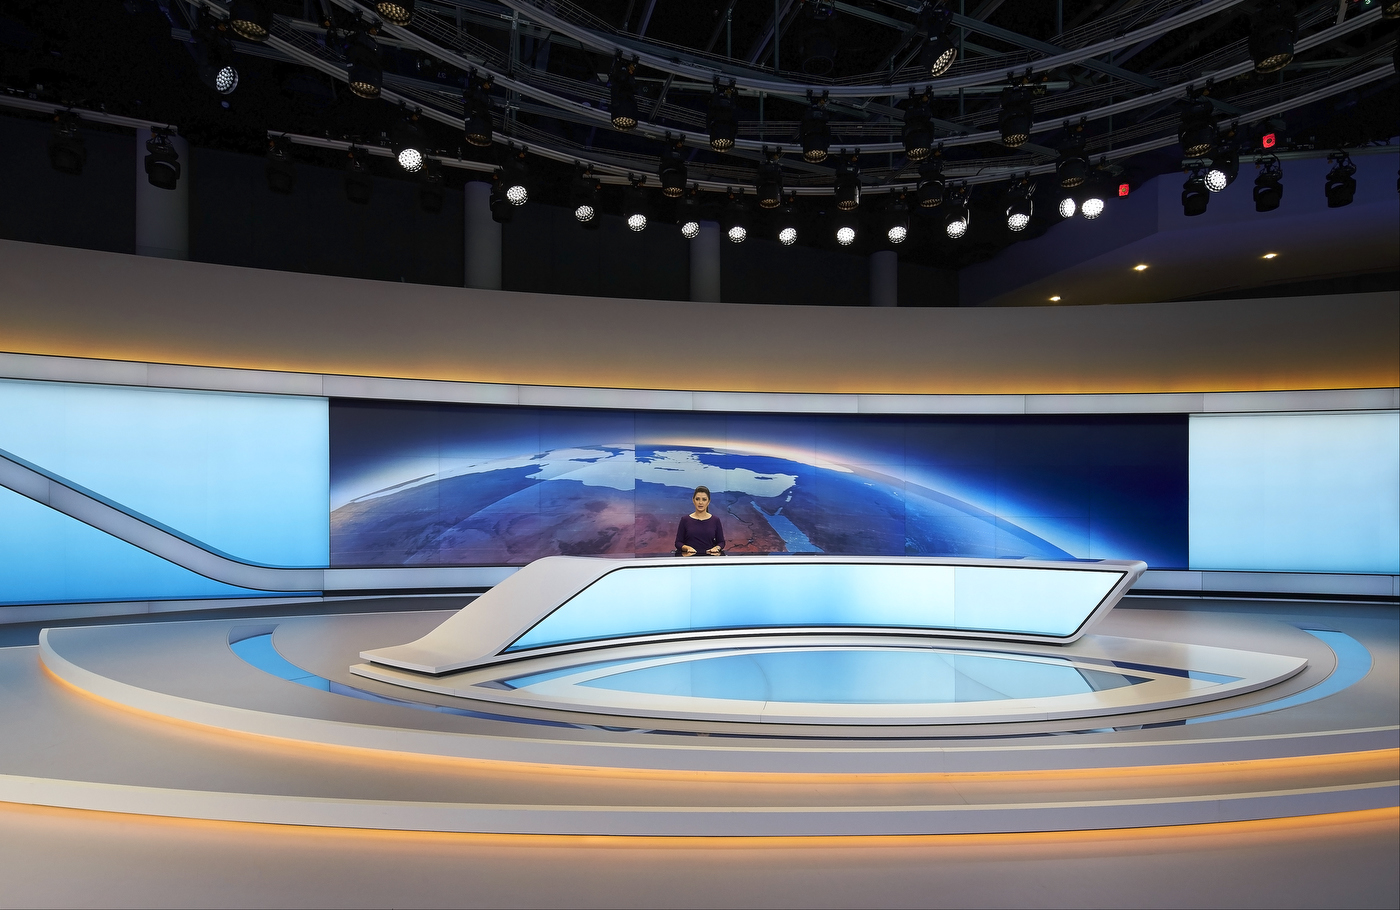 NCS_Al-Jazeera-Newsroom-Studio-5_0006